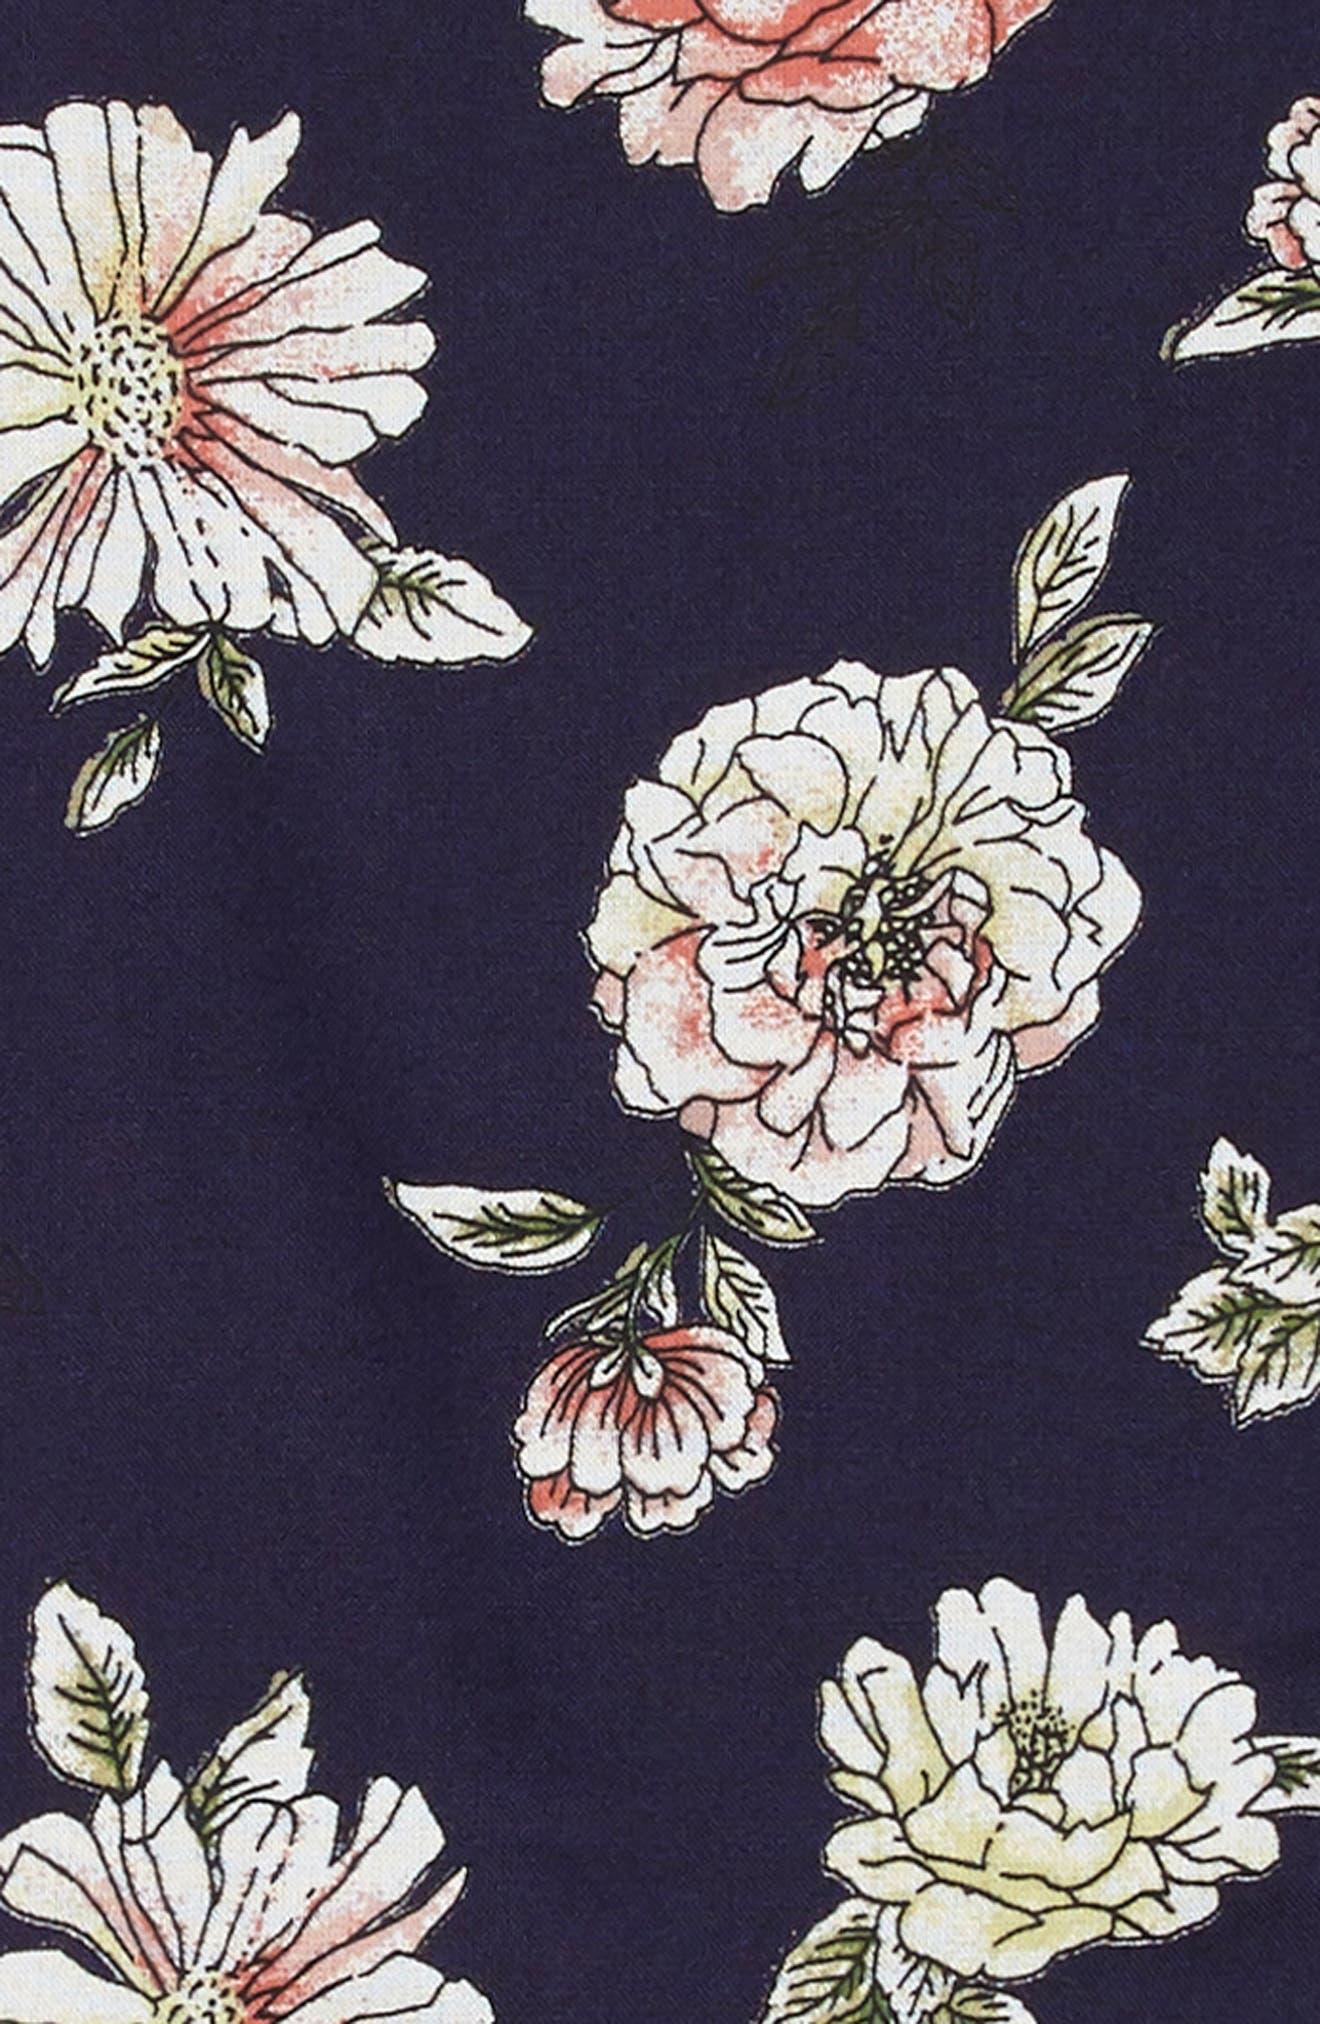 Floral Walk Through Romper,                             Alternate thumbnail 3, color,                             Navy/ Coral